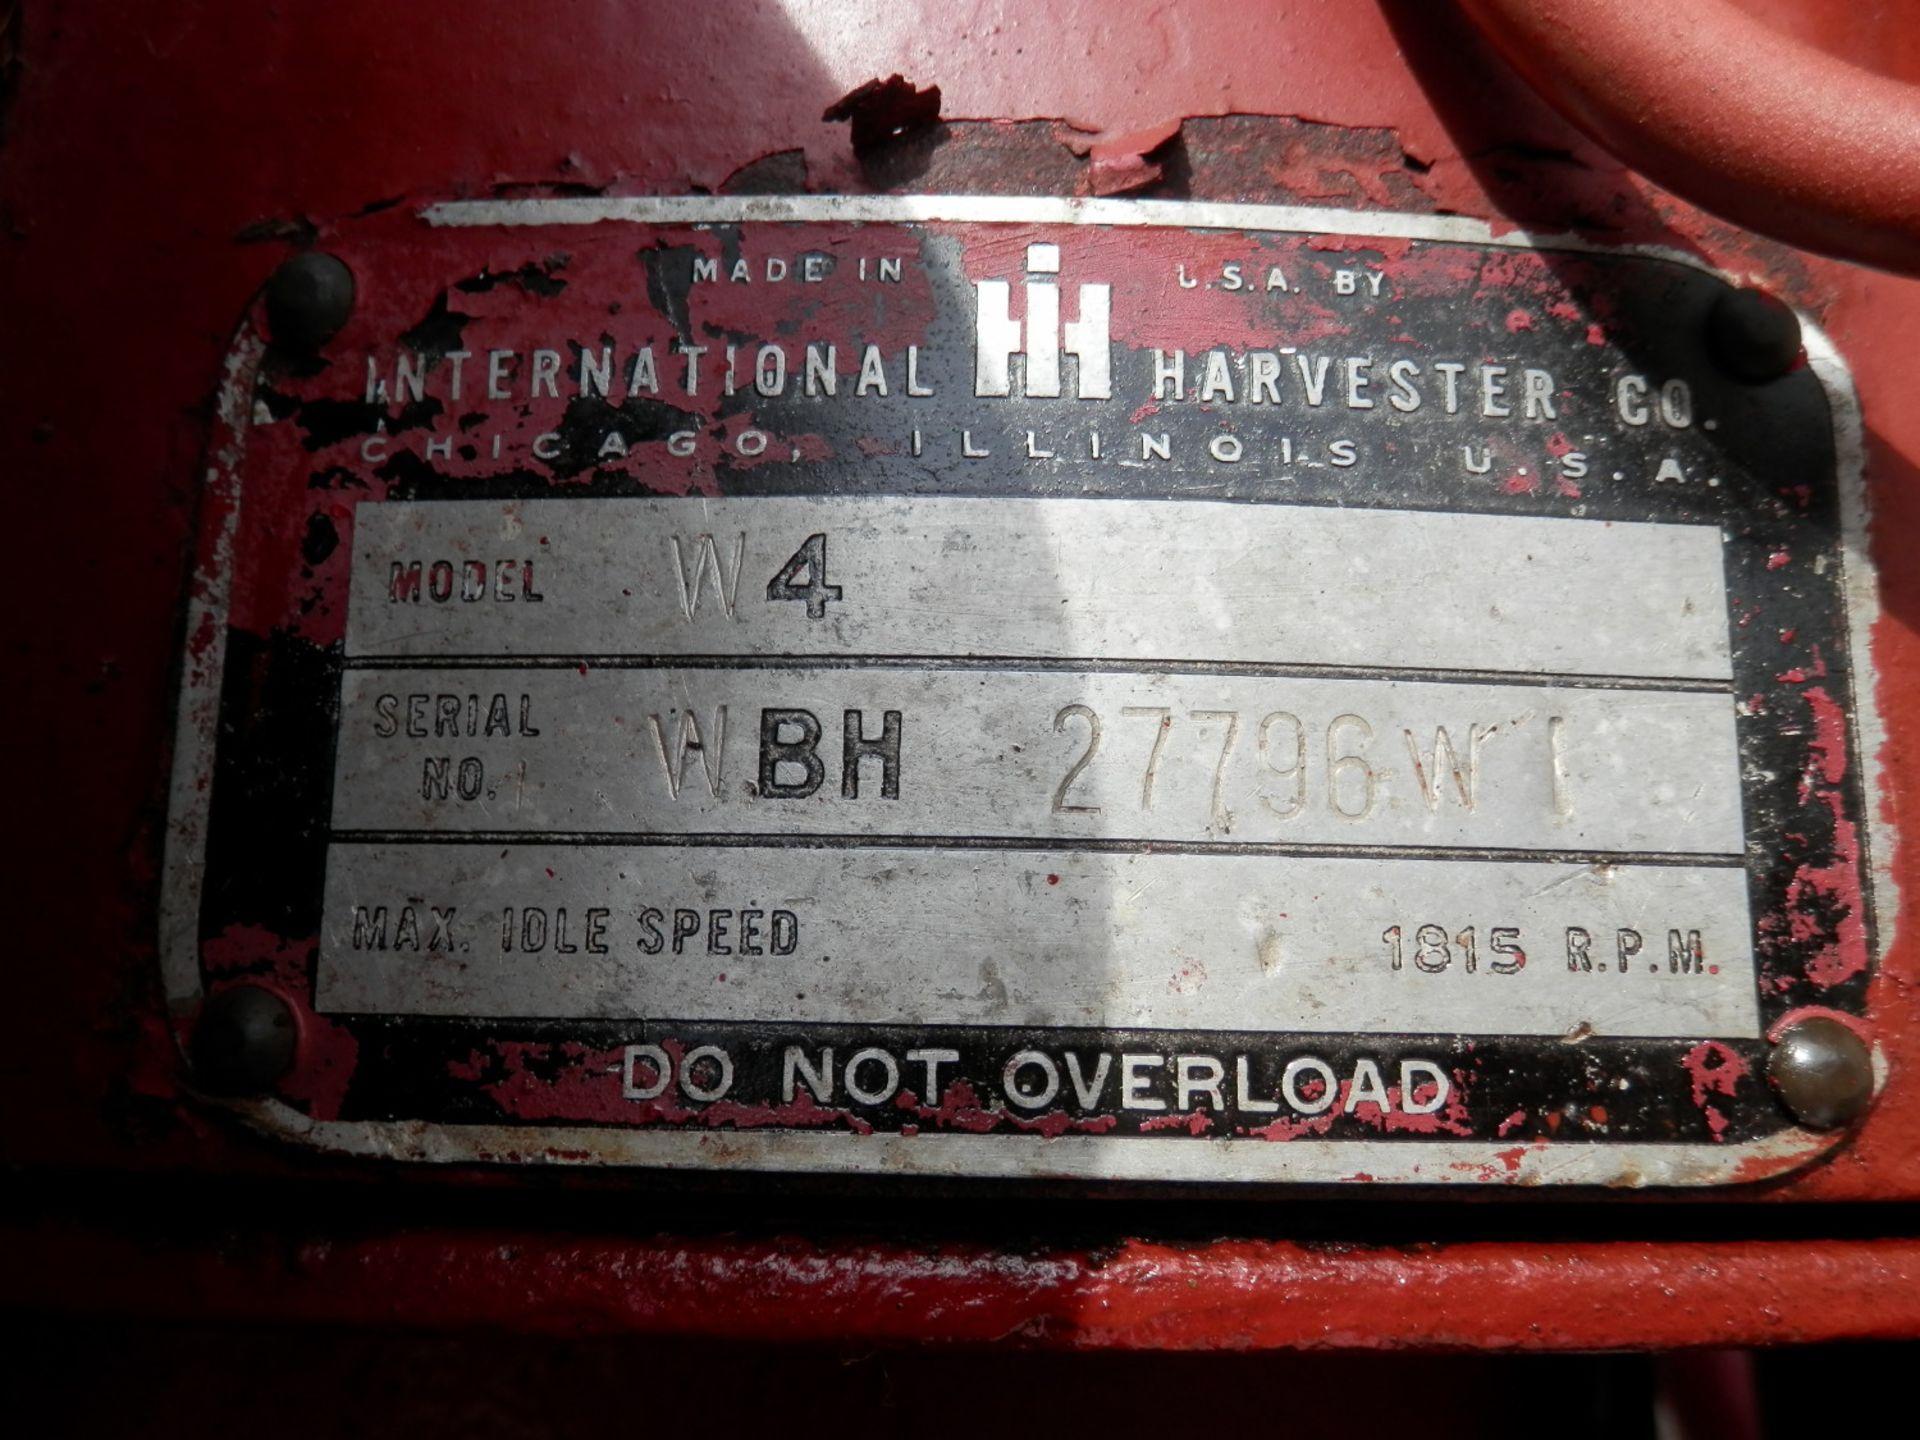 IH MC CORMICK W-4 STANDARD TRACTOR - Image 11 of 11